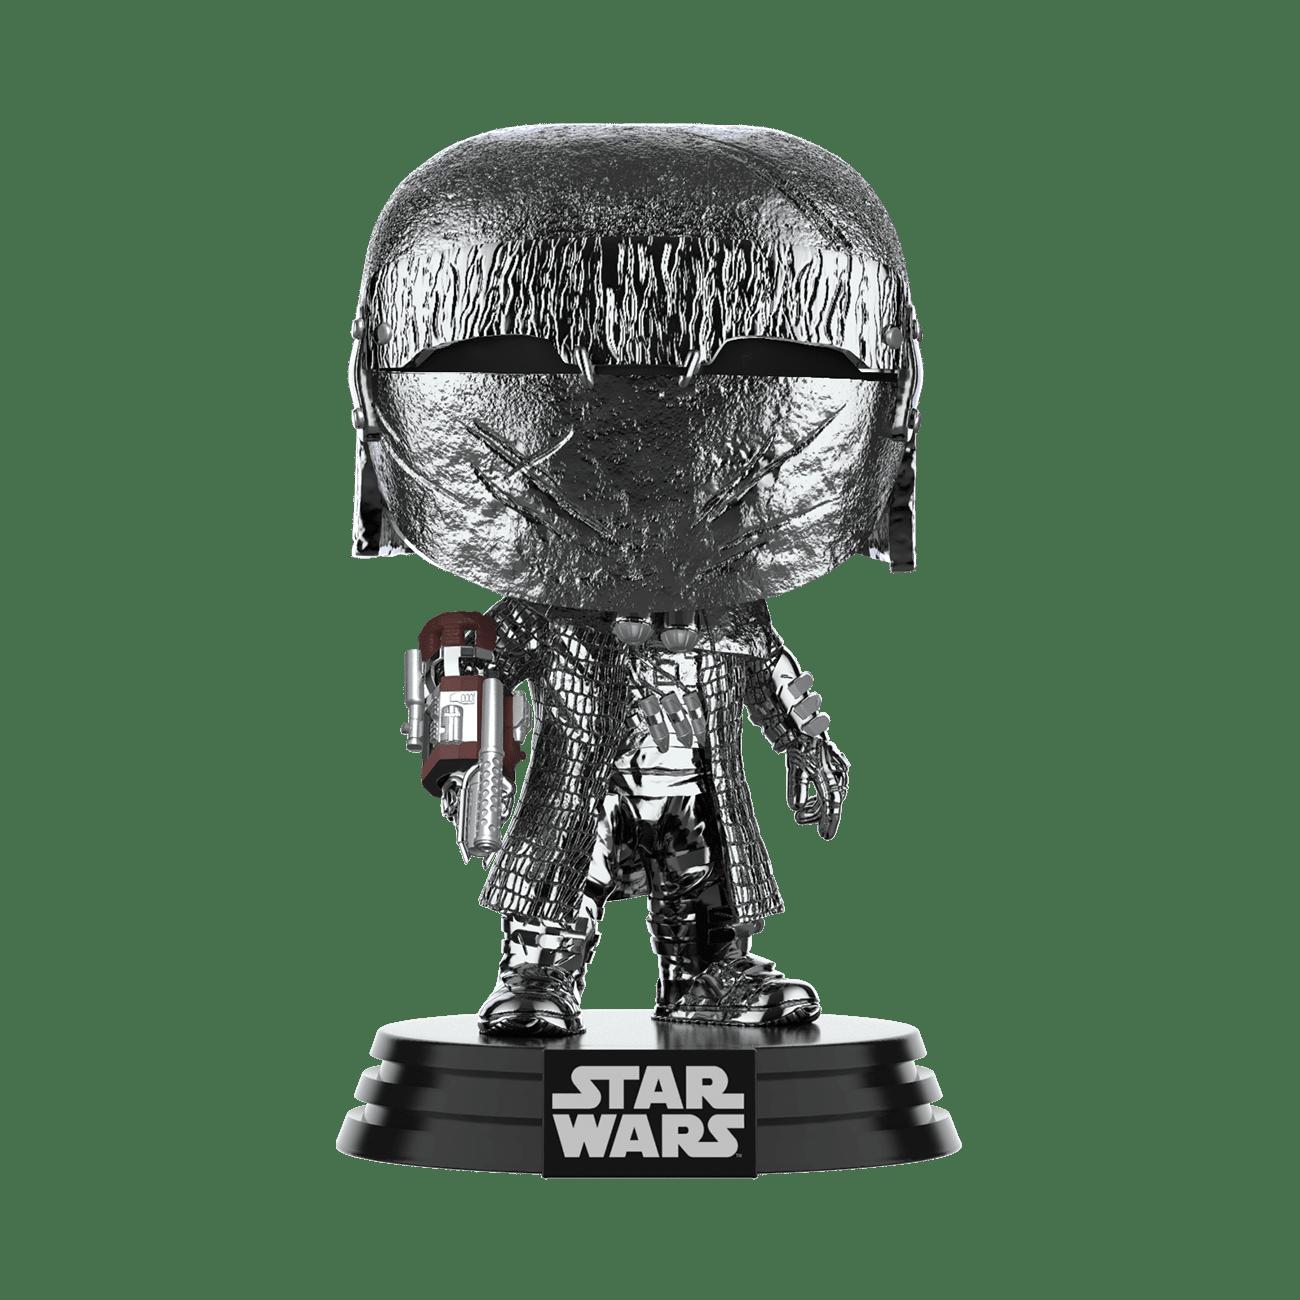 PRE-ORDER Star Wars: The Rise of Skywalker Hematite Chrome Knight of Ren Cannon Pop! Vinyl Figure